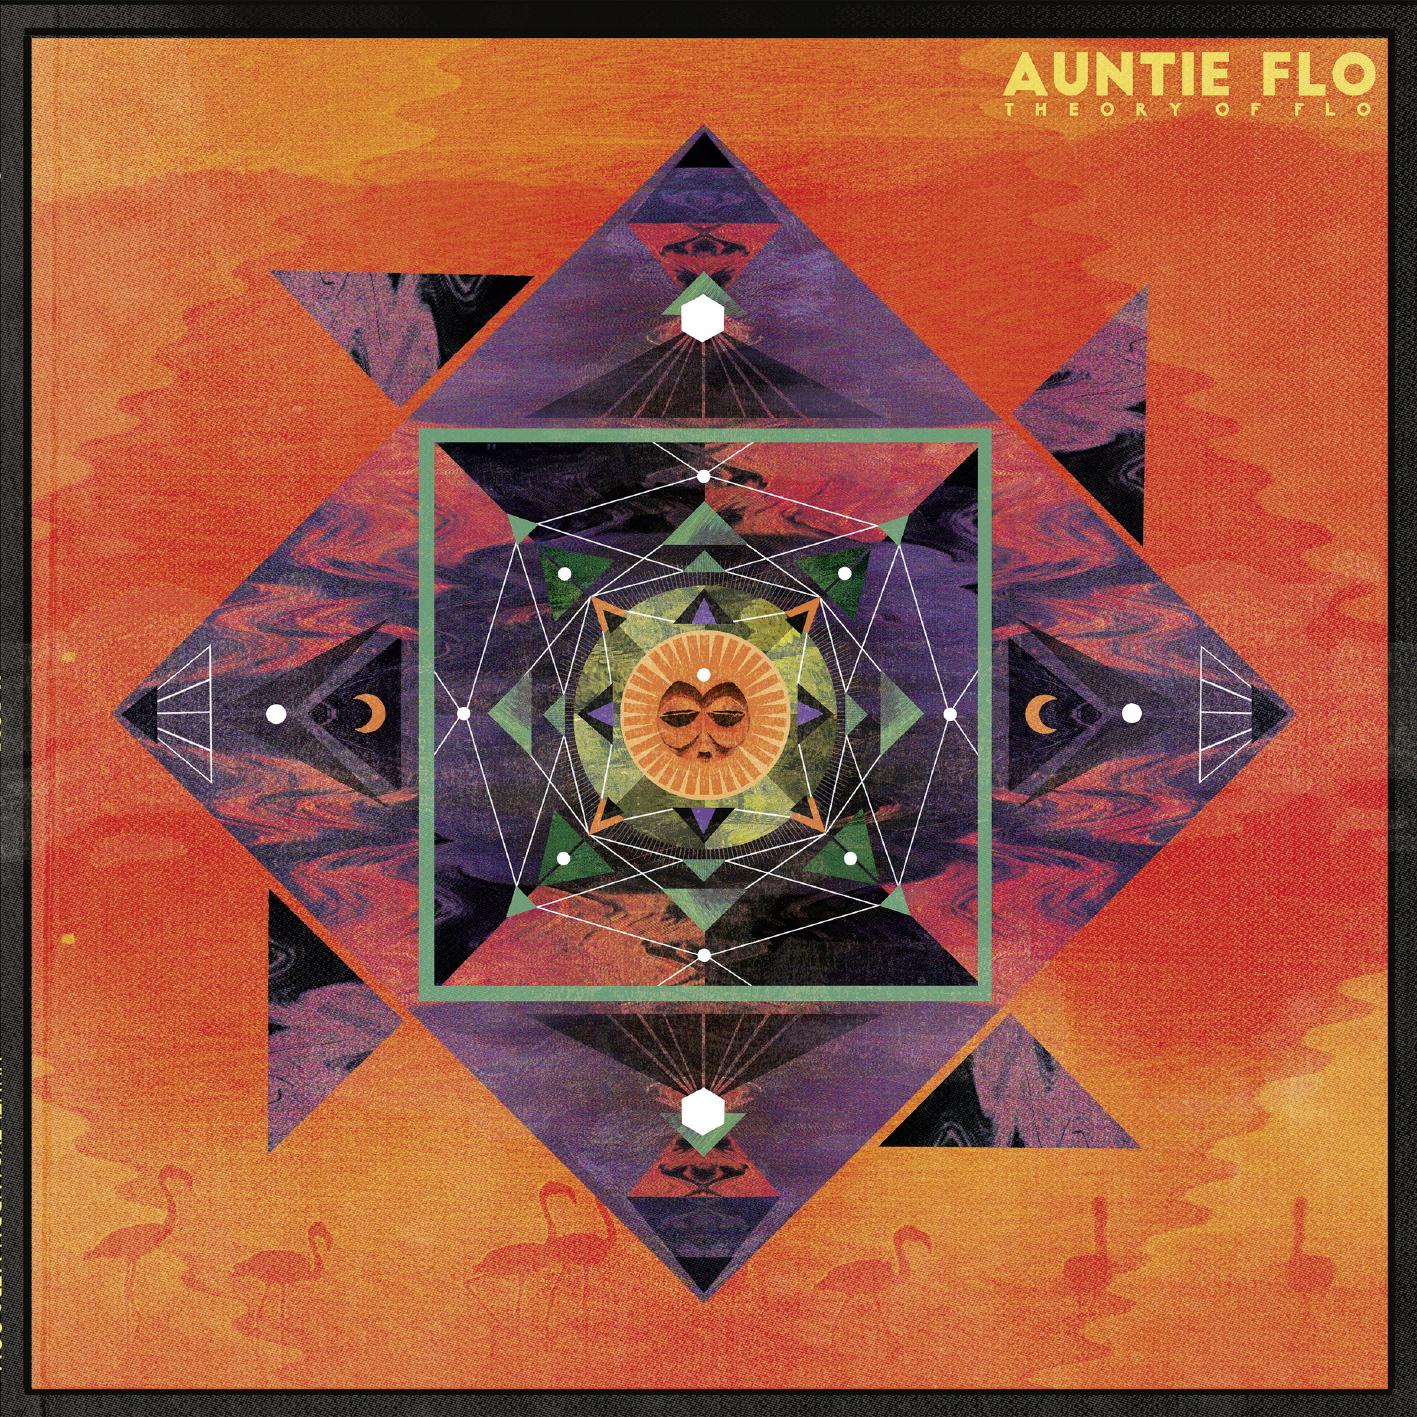 Auntie Flo/THEORY OF FLO DLP